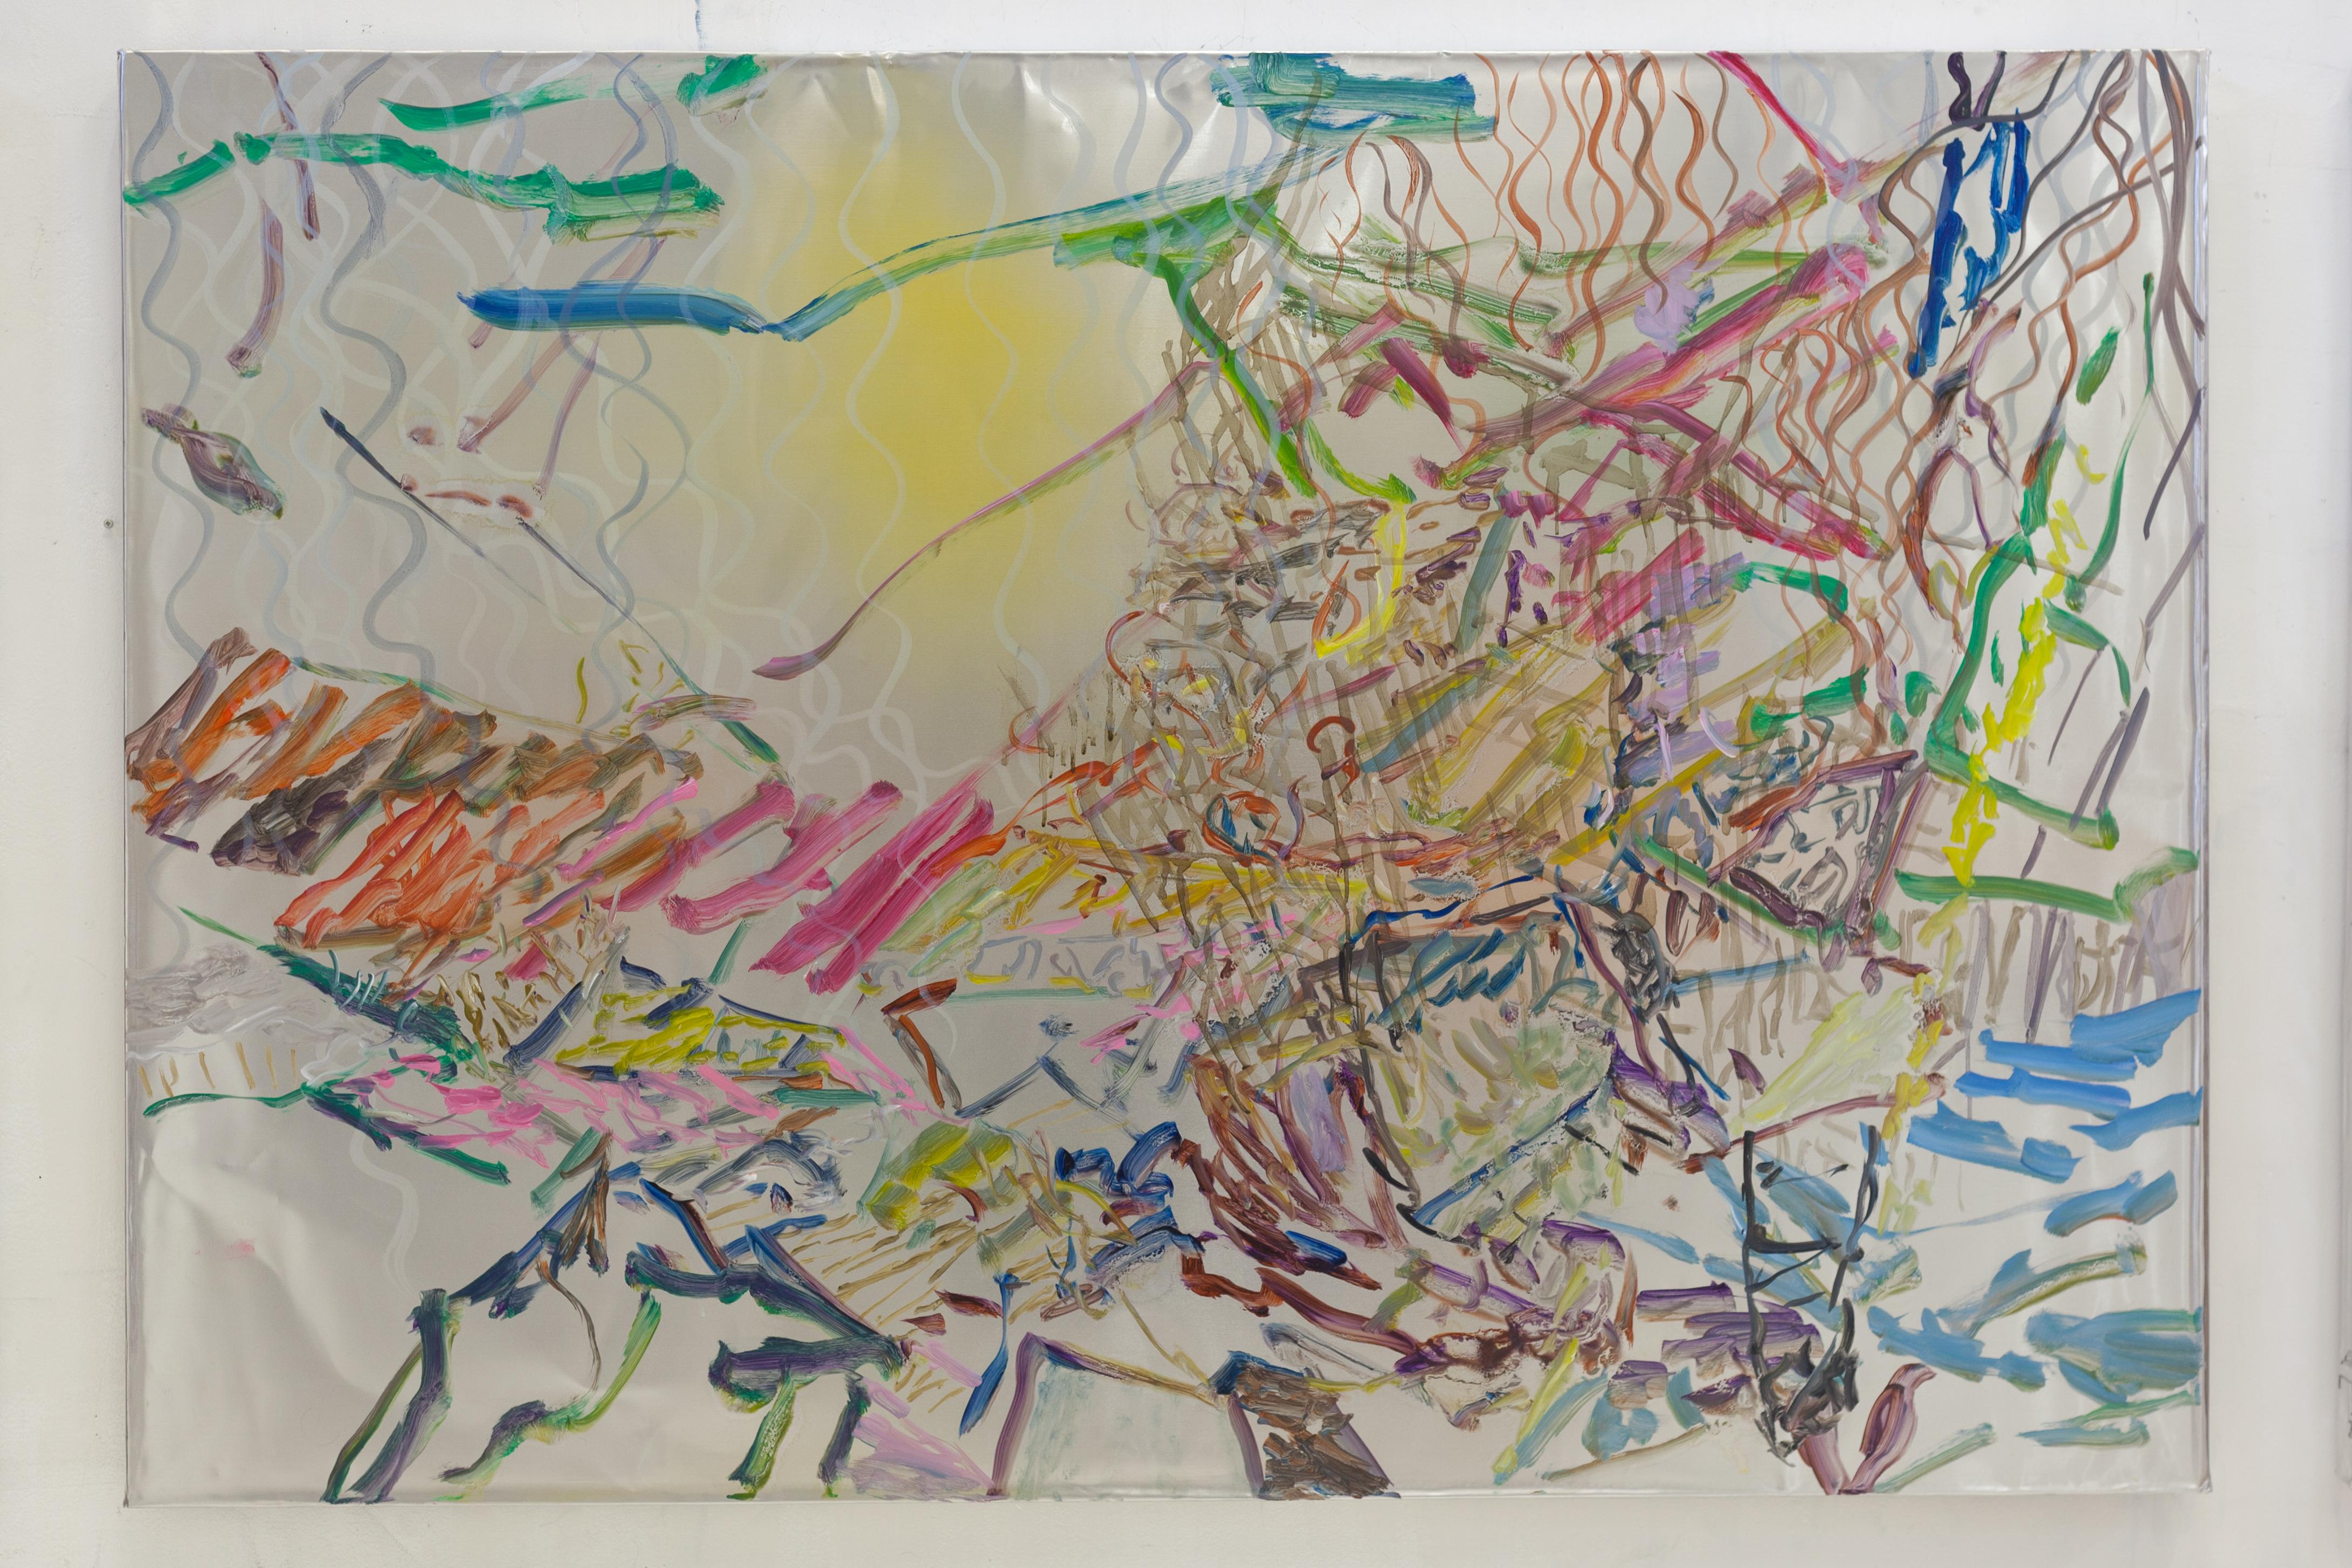 Henrik Eriksson, Utan titel (dhs 07), 2018 Oil on aluminium, 85 x 122 cm